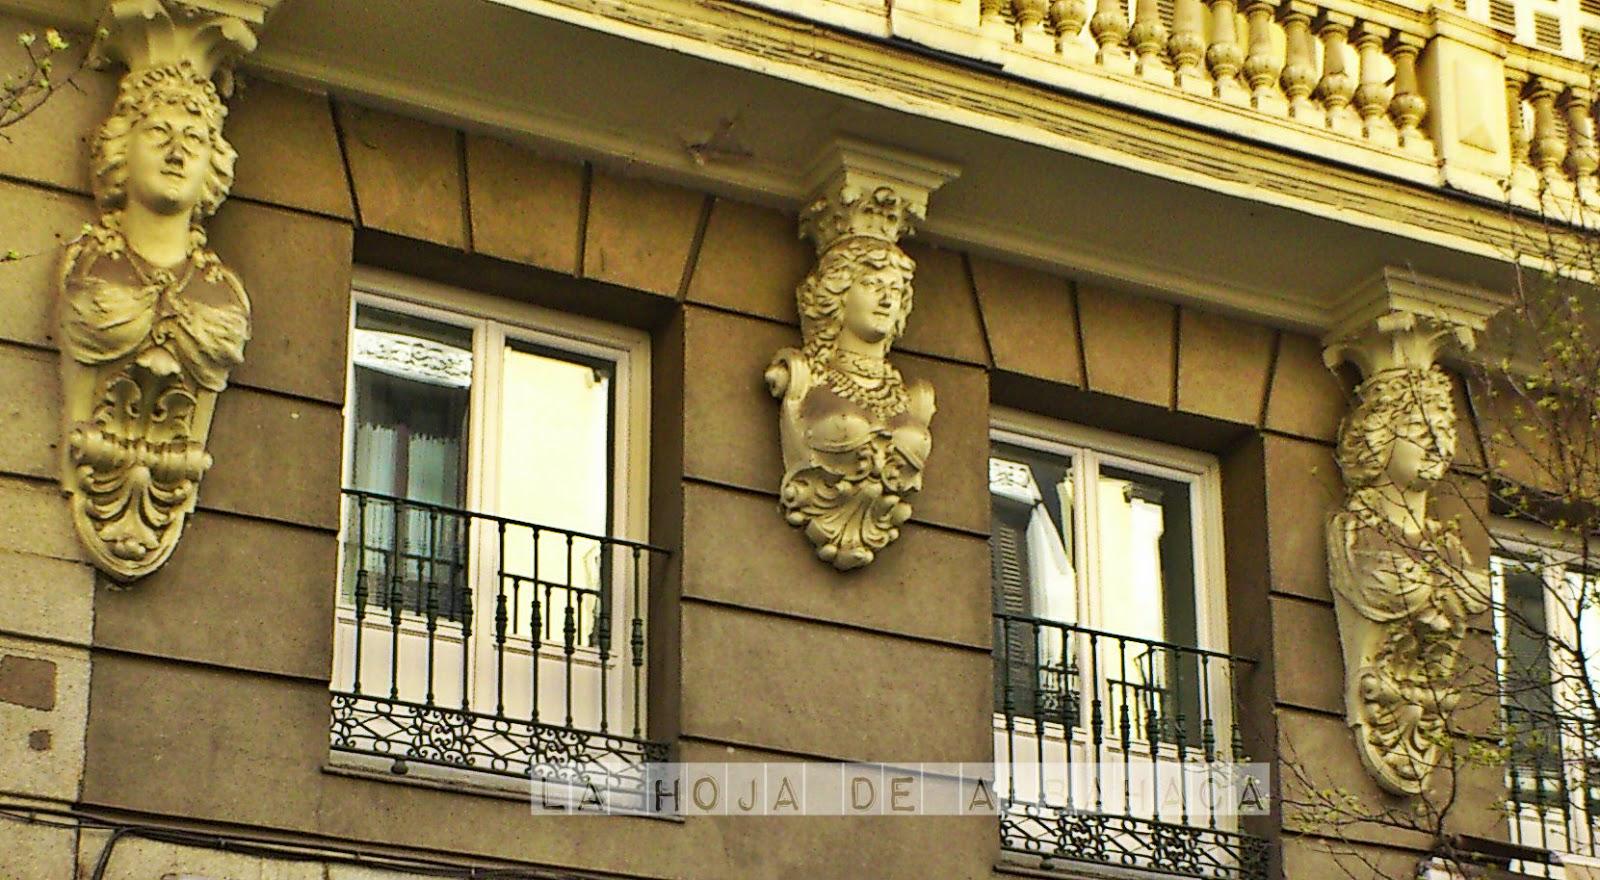 blogger traveller marzo, madrid , arquitectua, palacios históricos